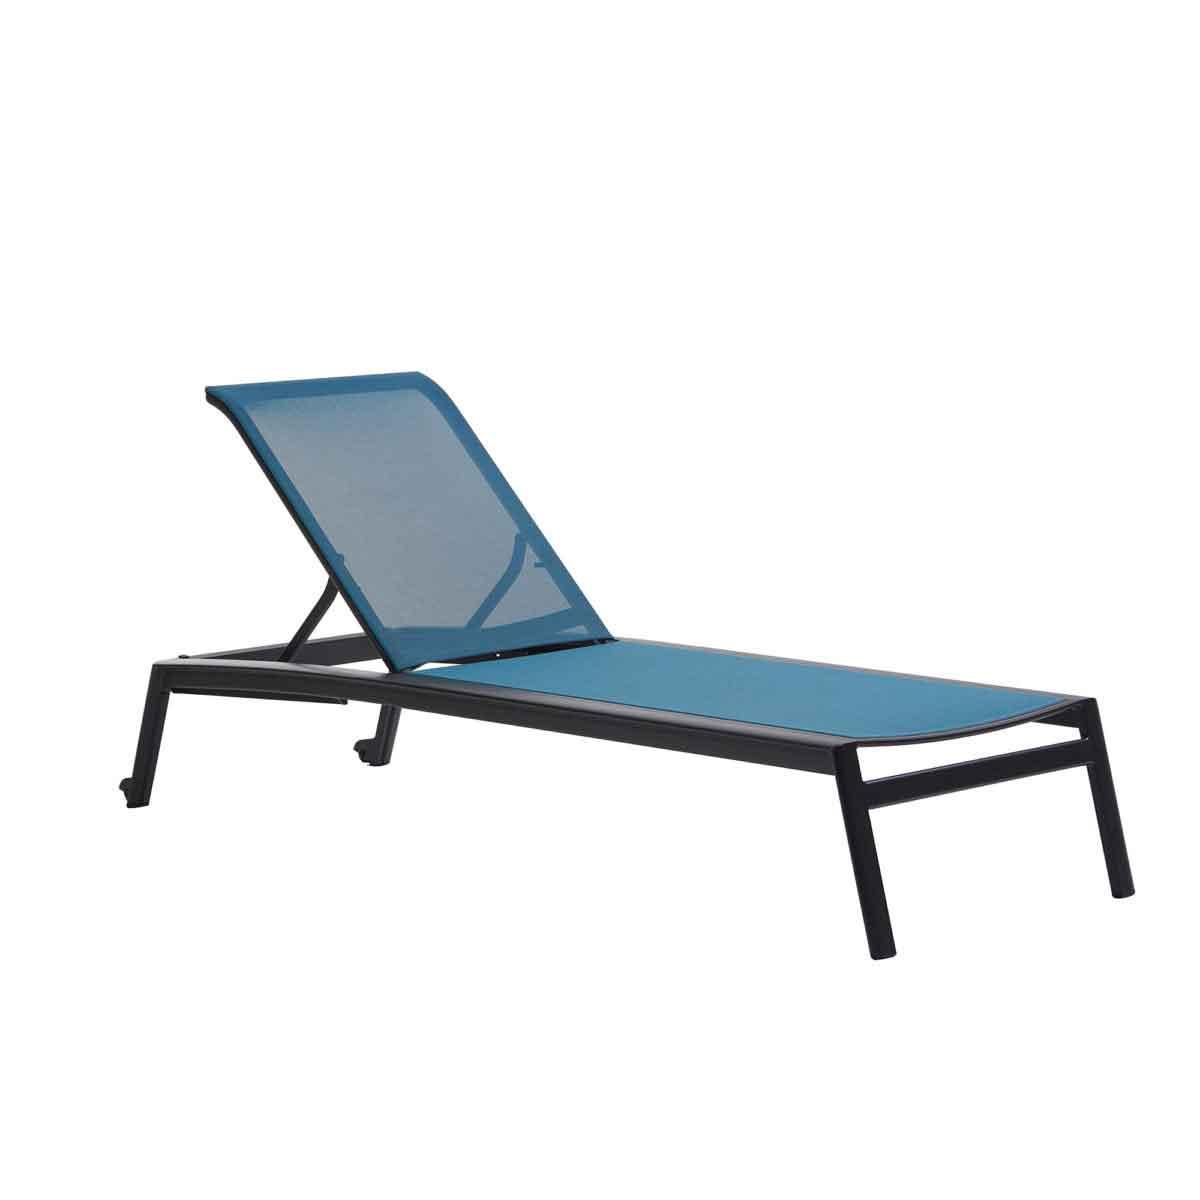 Lyon Sling Armless Chaise - Peacock